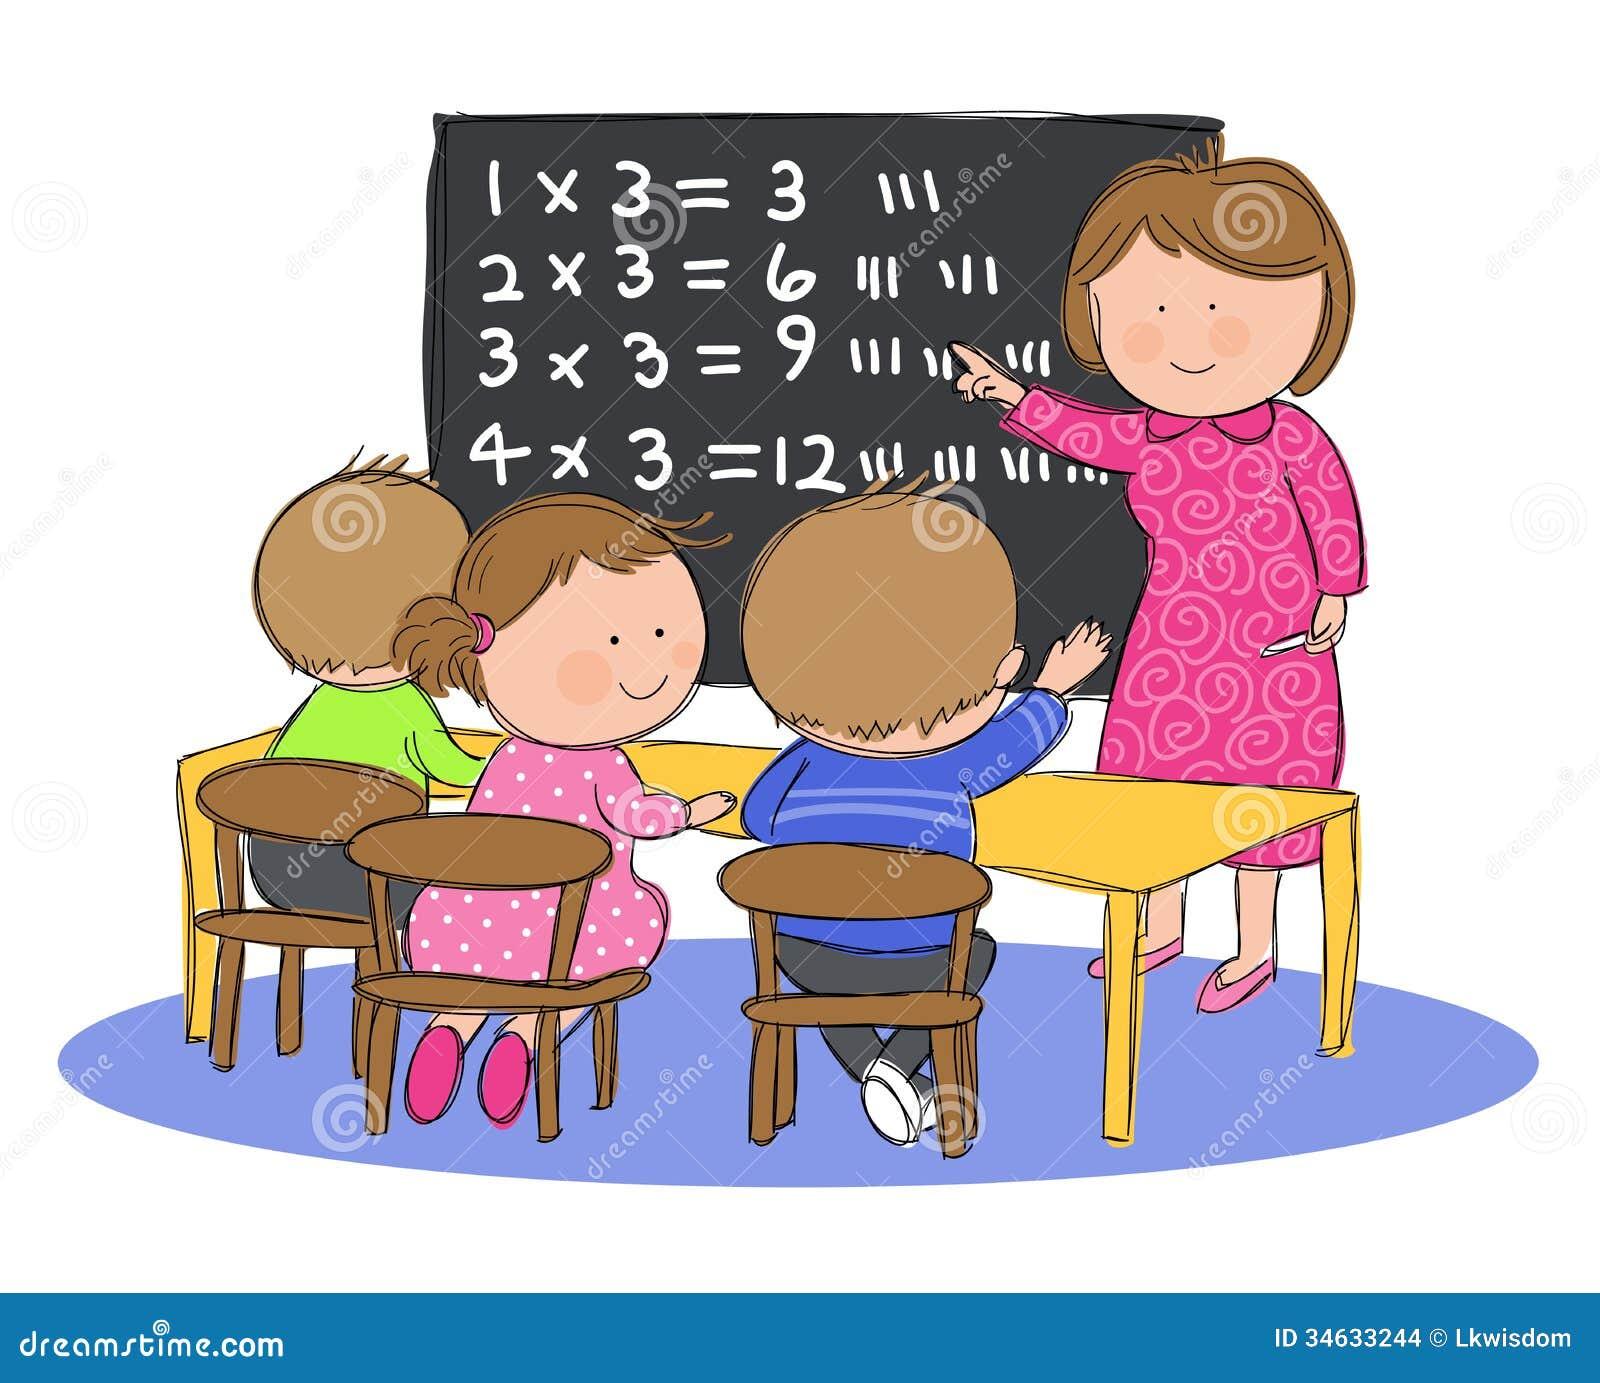 Worksheet Children Learning Maths children learning maths scalien kids in math class illustration 34633244 megapixl